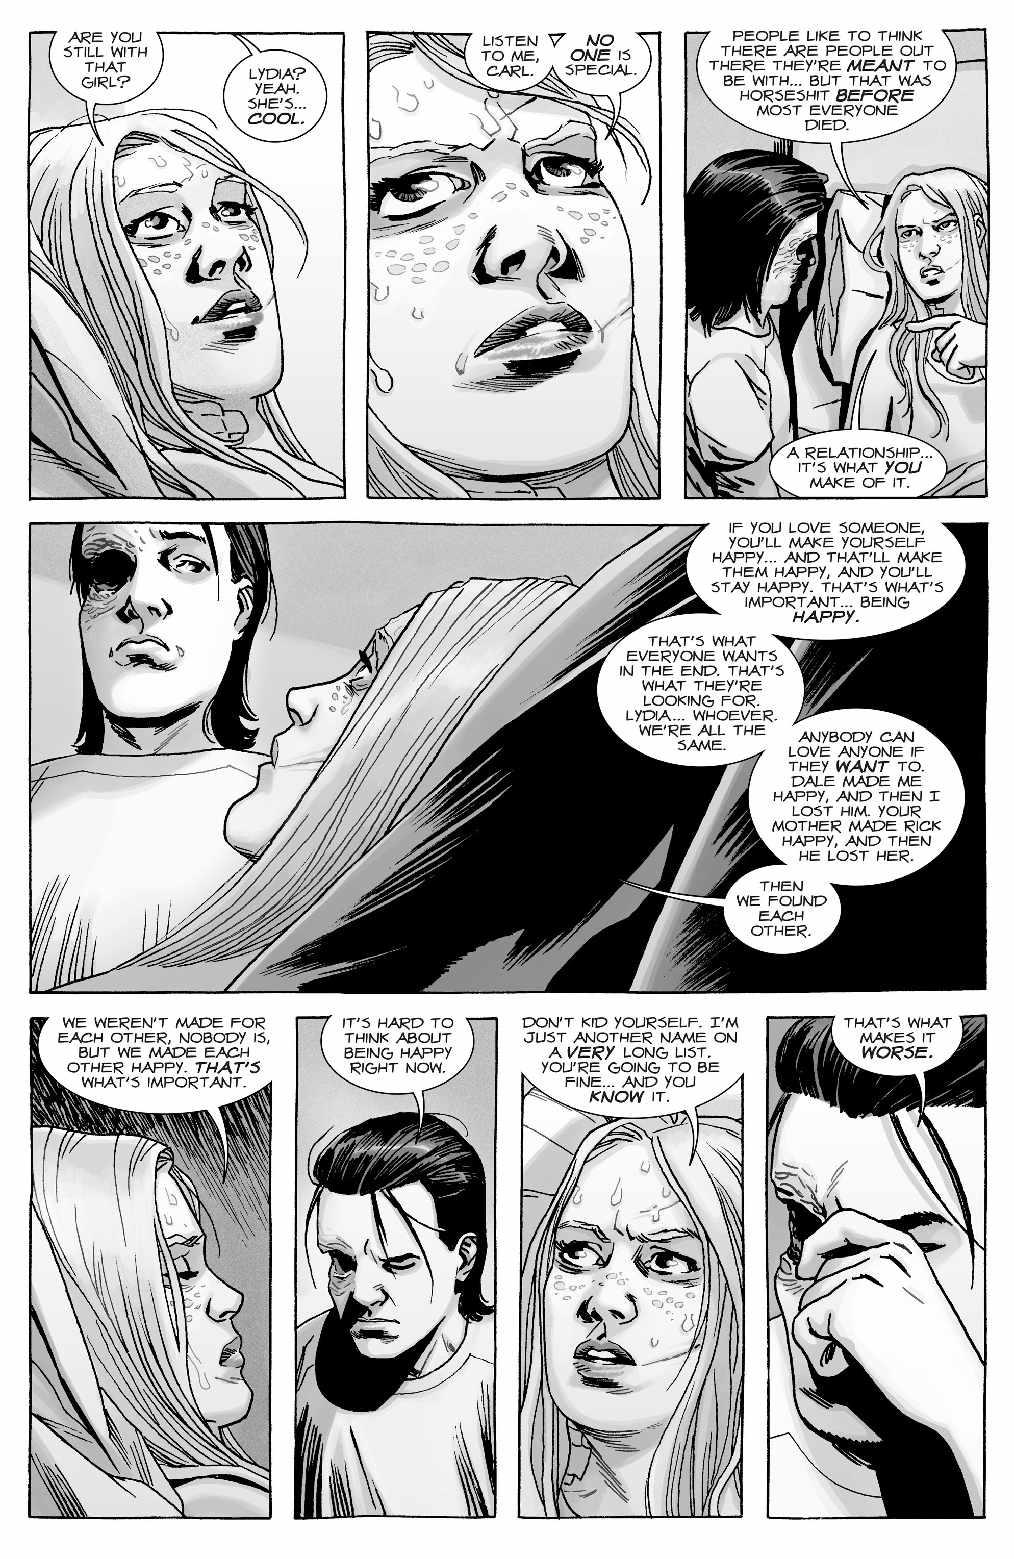 Read Comics Online Free - The Walking Dead - Chapter 167